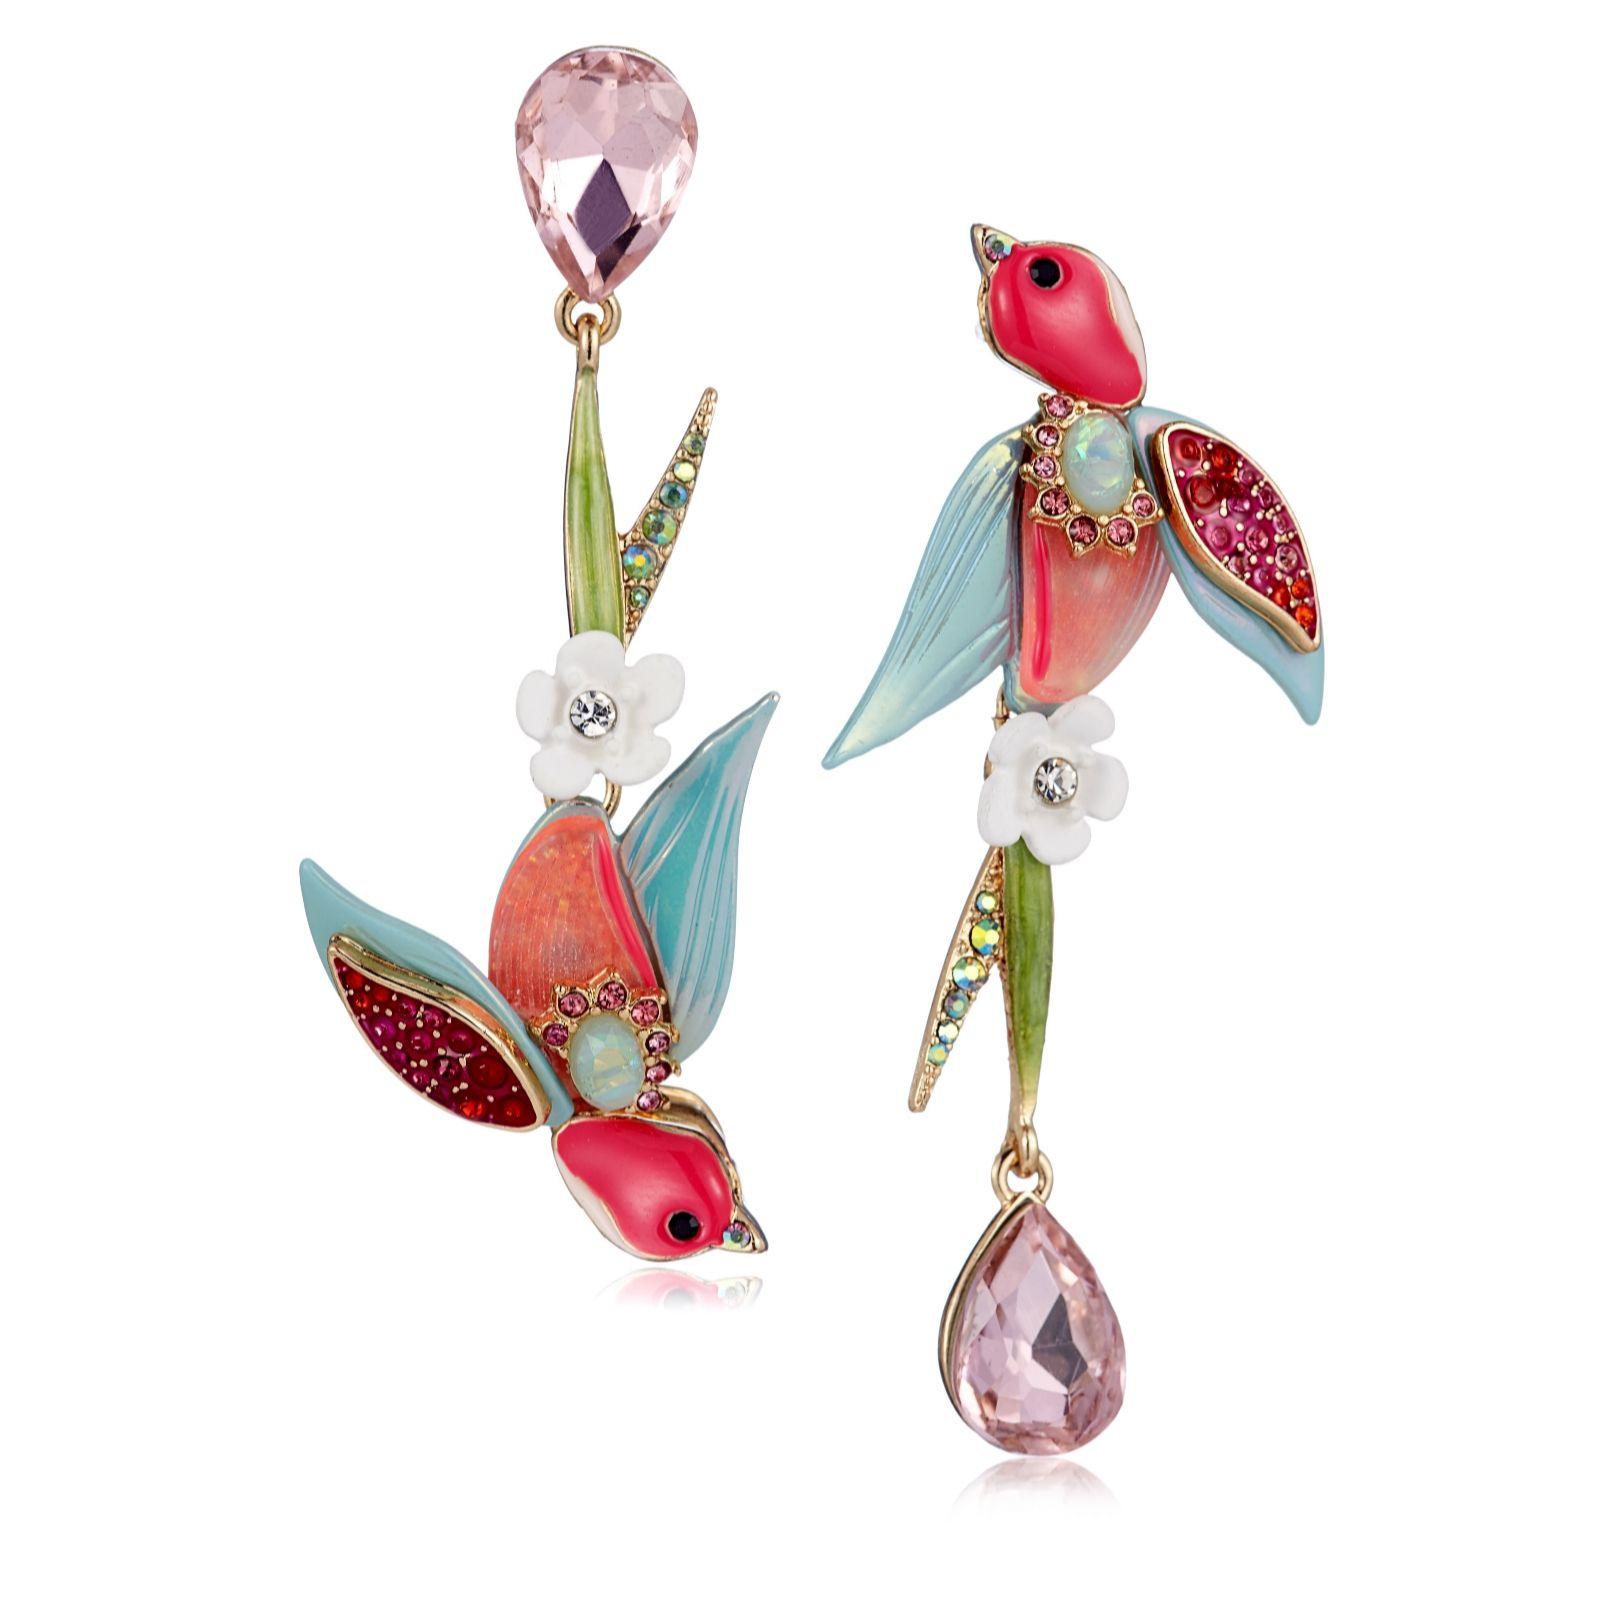 97ca11e01c4b4 Betsey Johnson Swallow Earrings - QVC UK